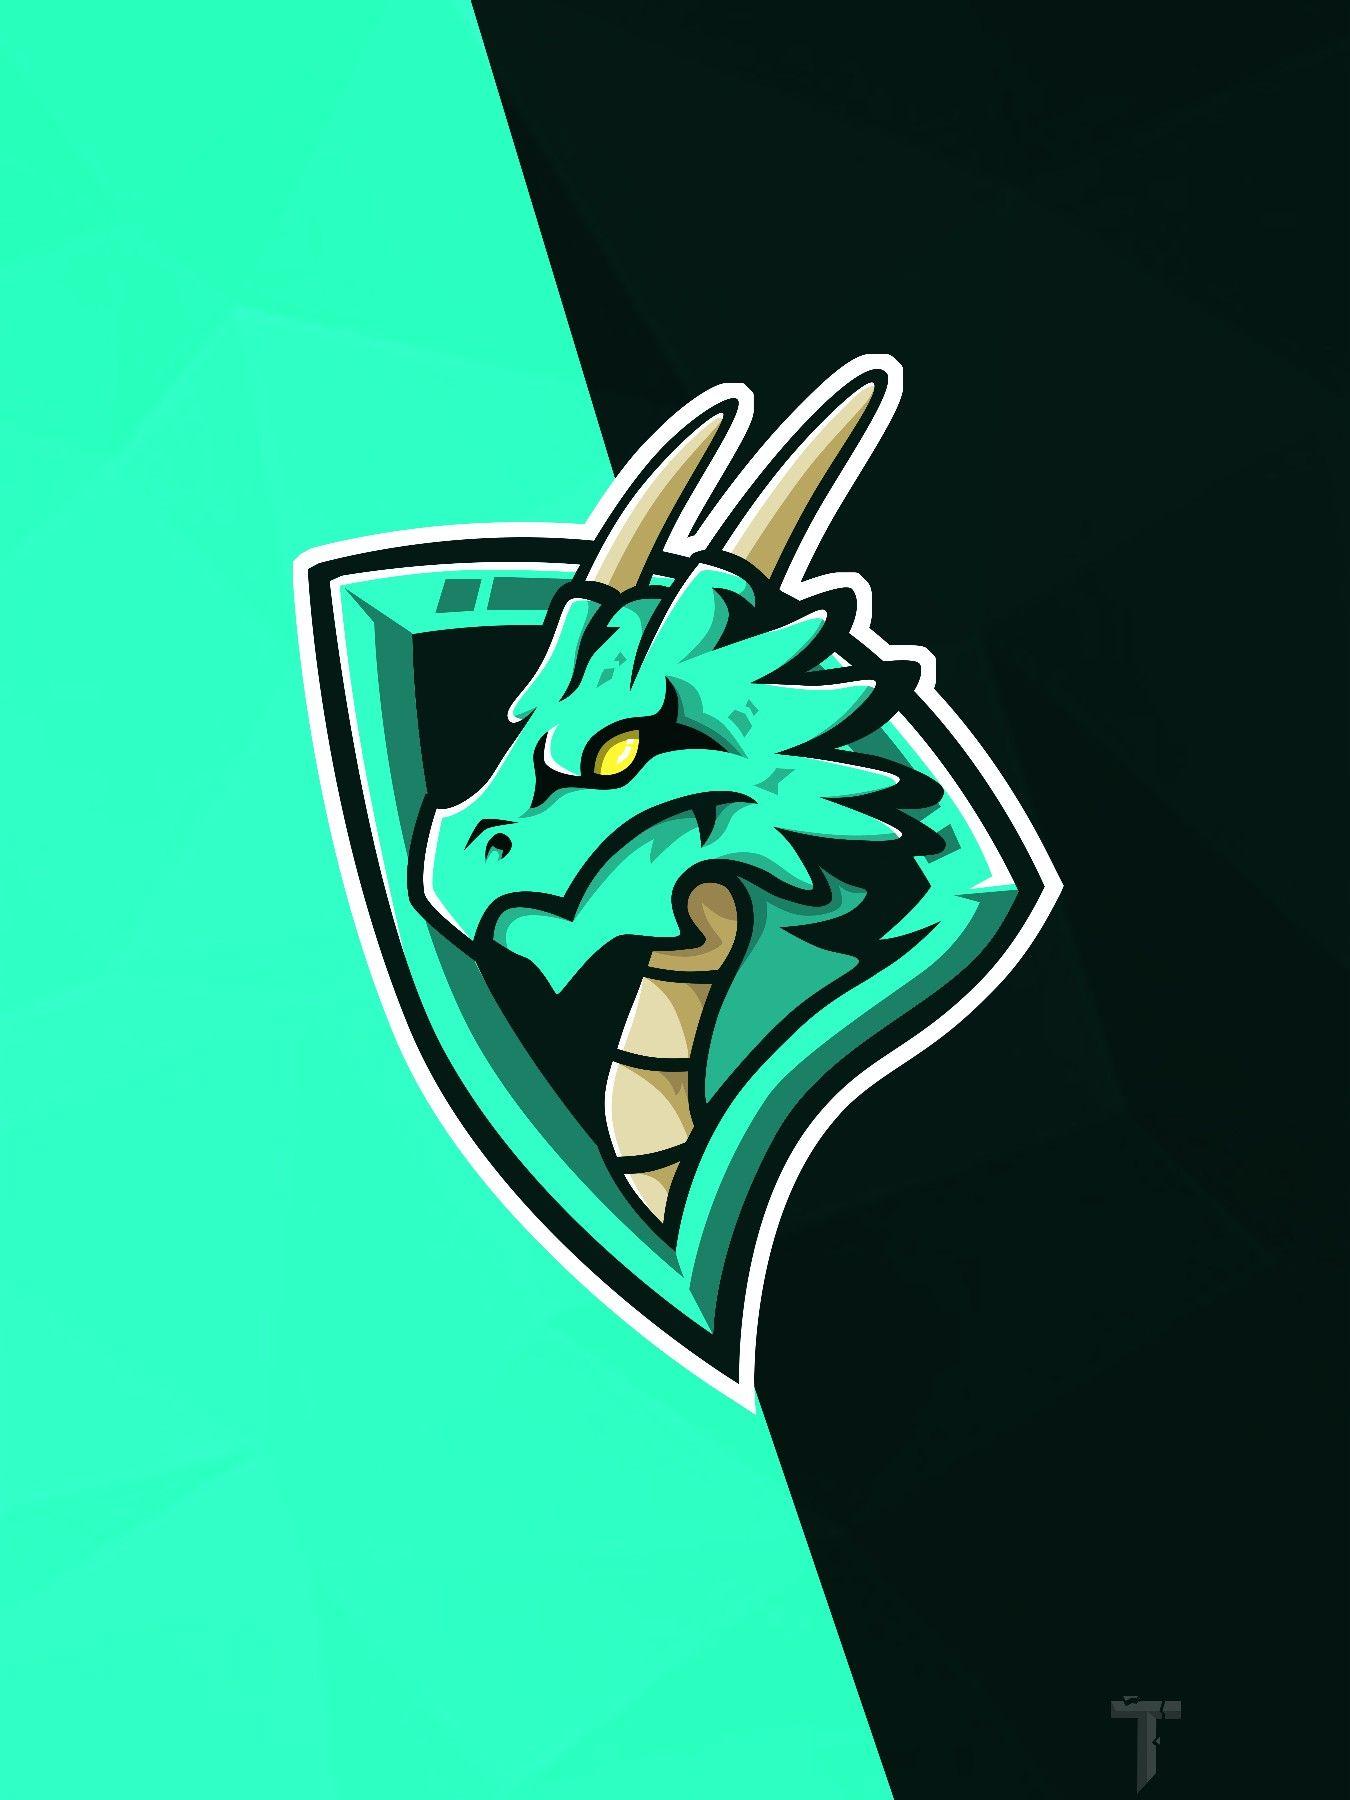 Dragon Mascot logo fortnite background wallpaper png